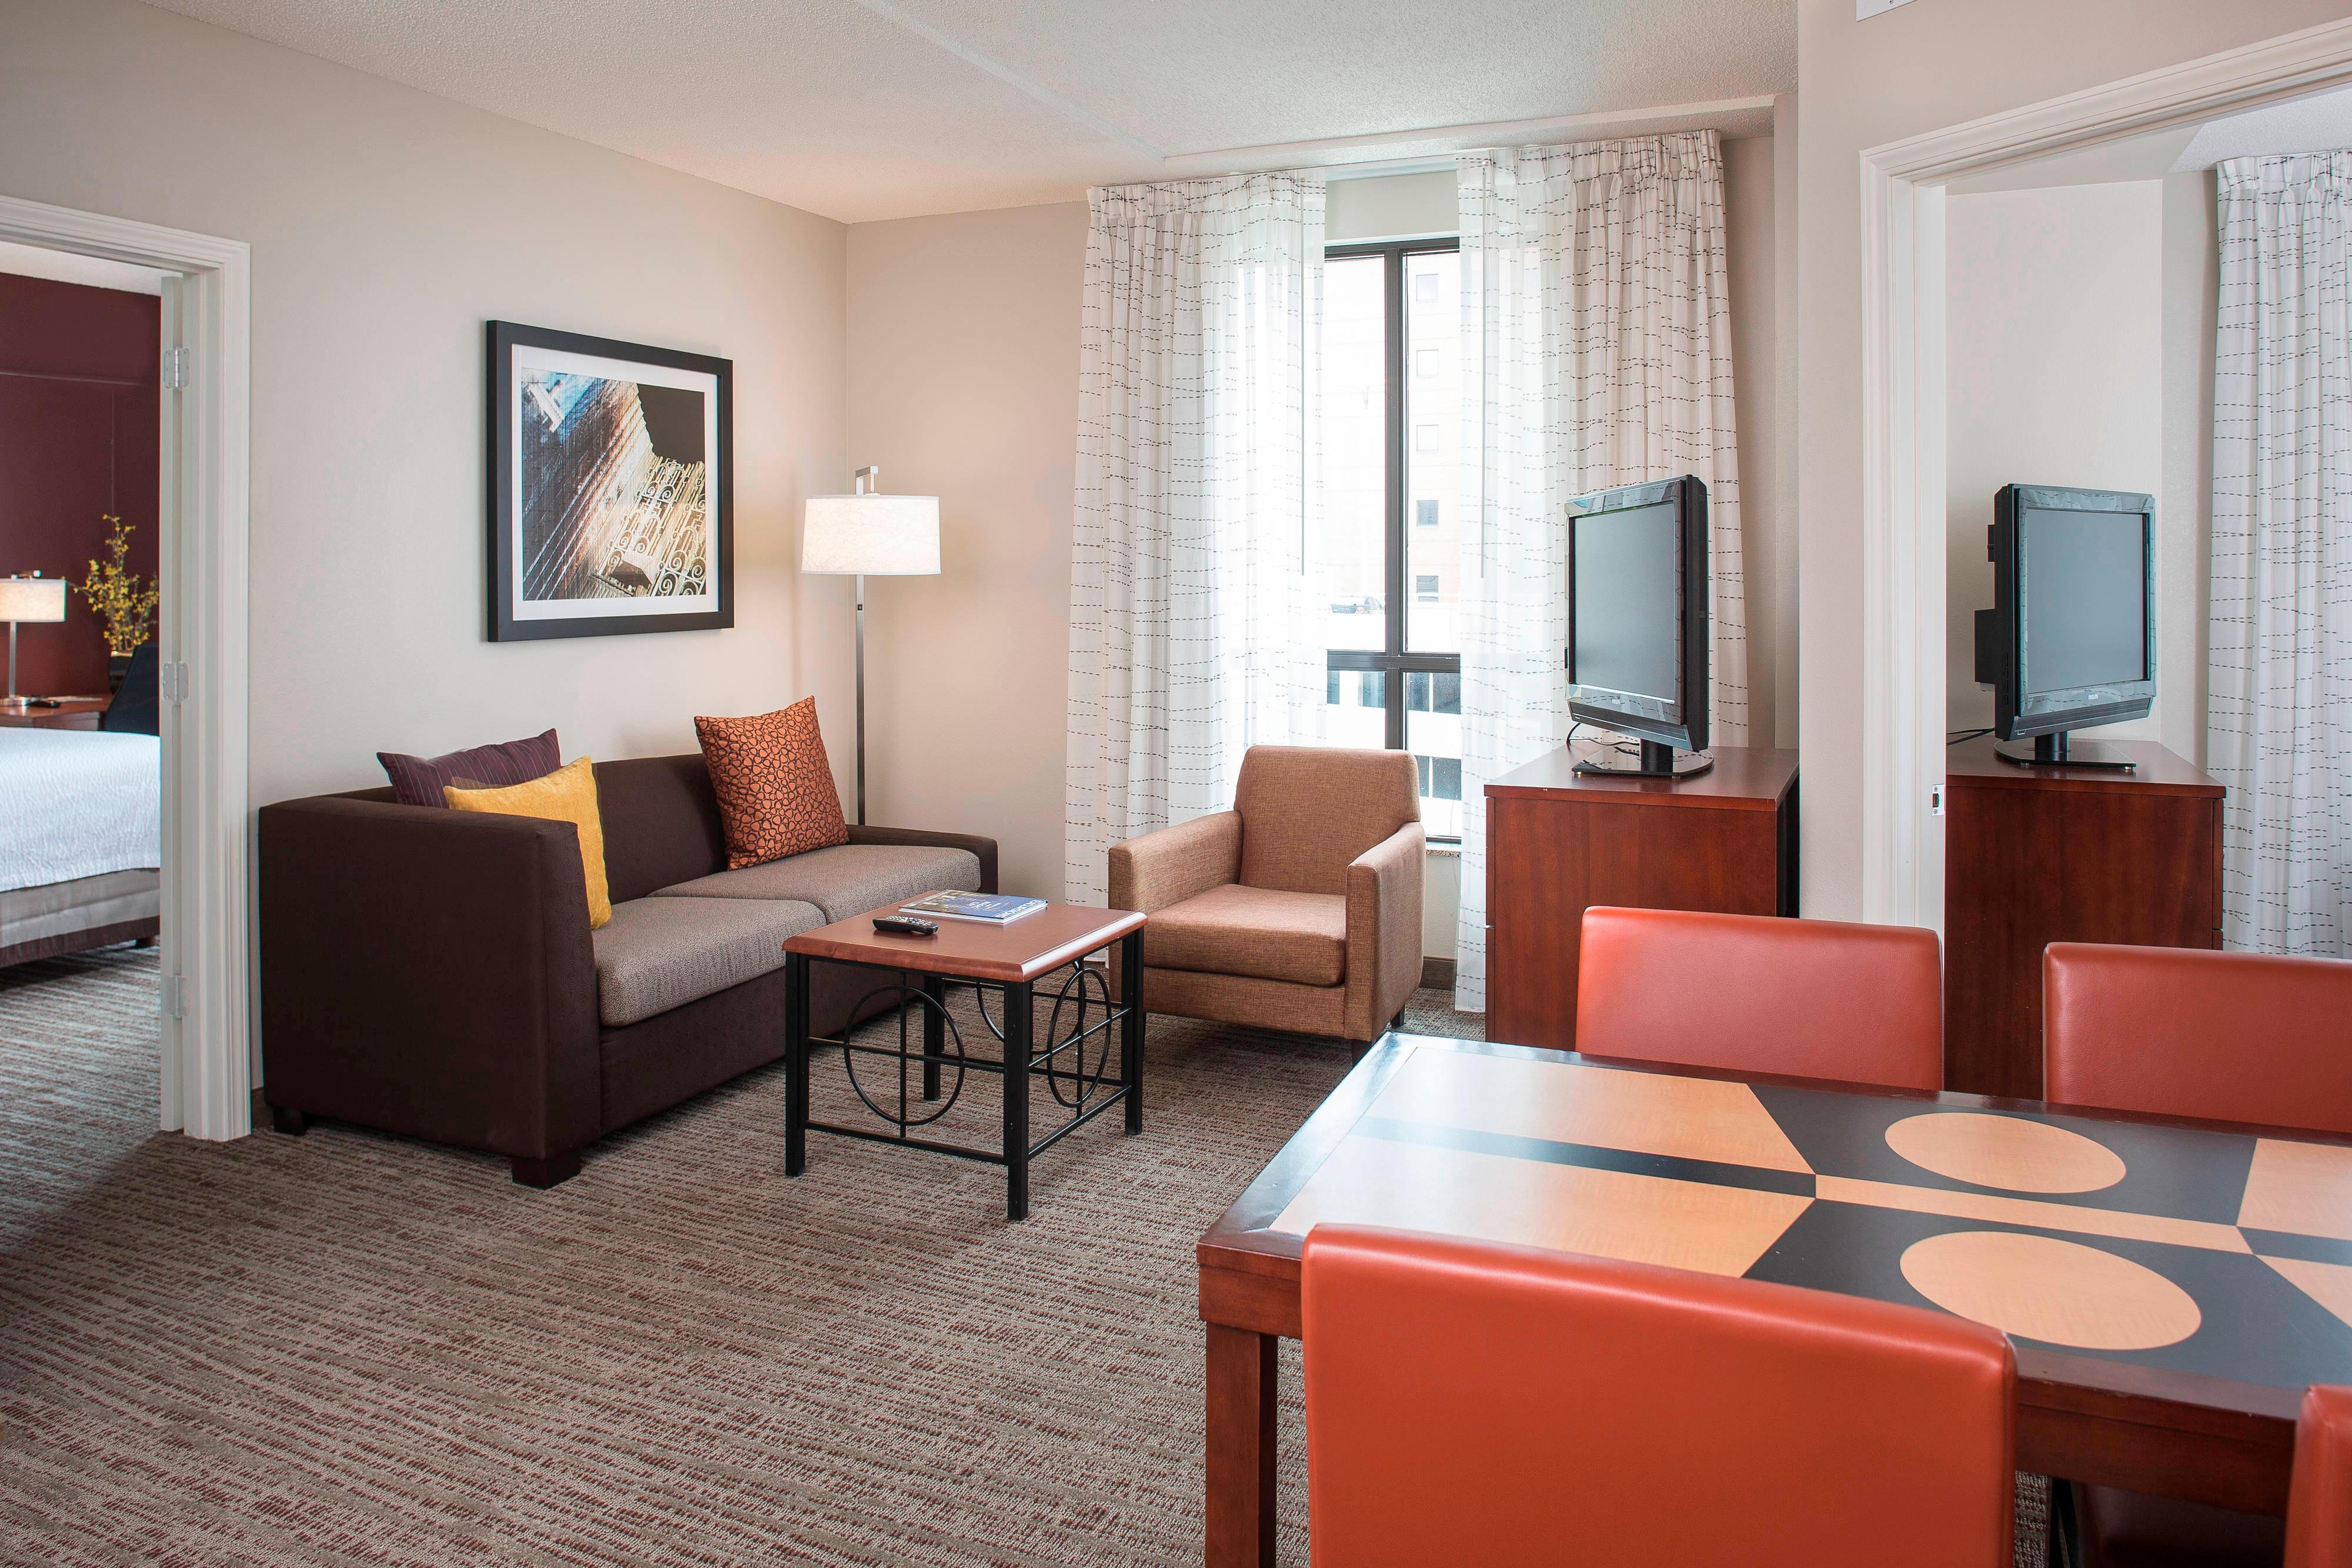 Residence Inn Birmingham Downtown Uab Hotel Amenities